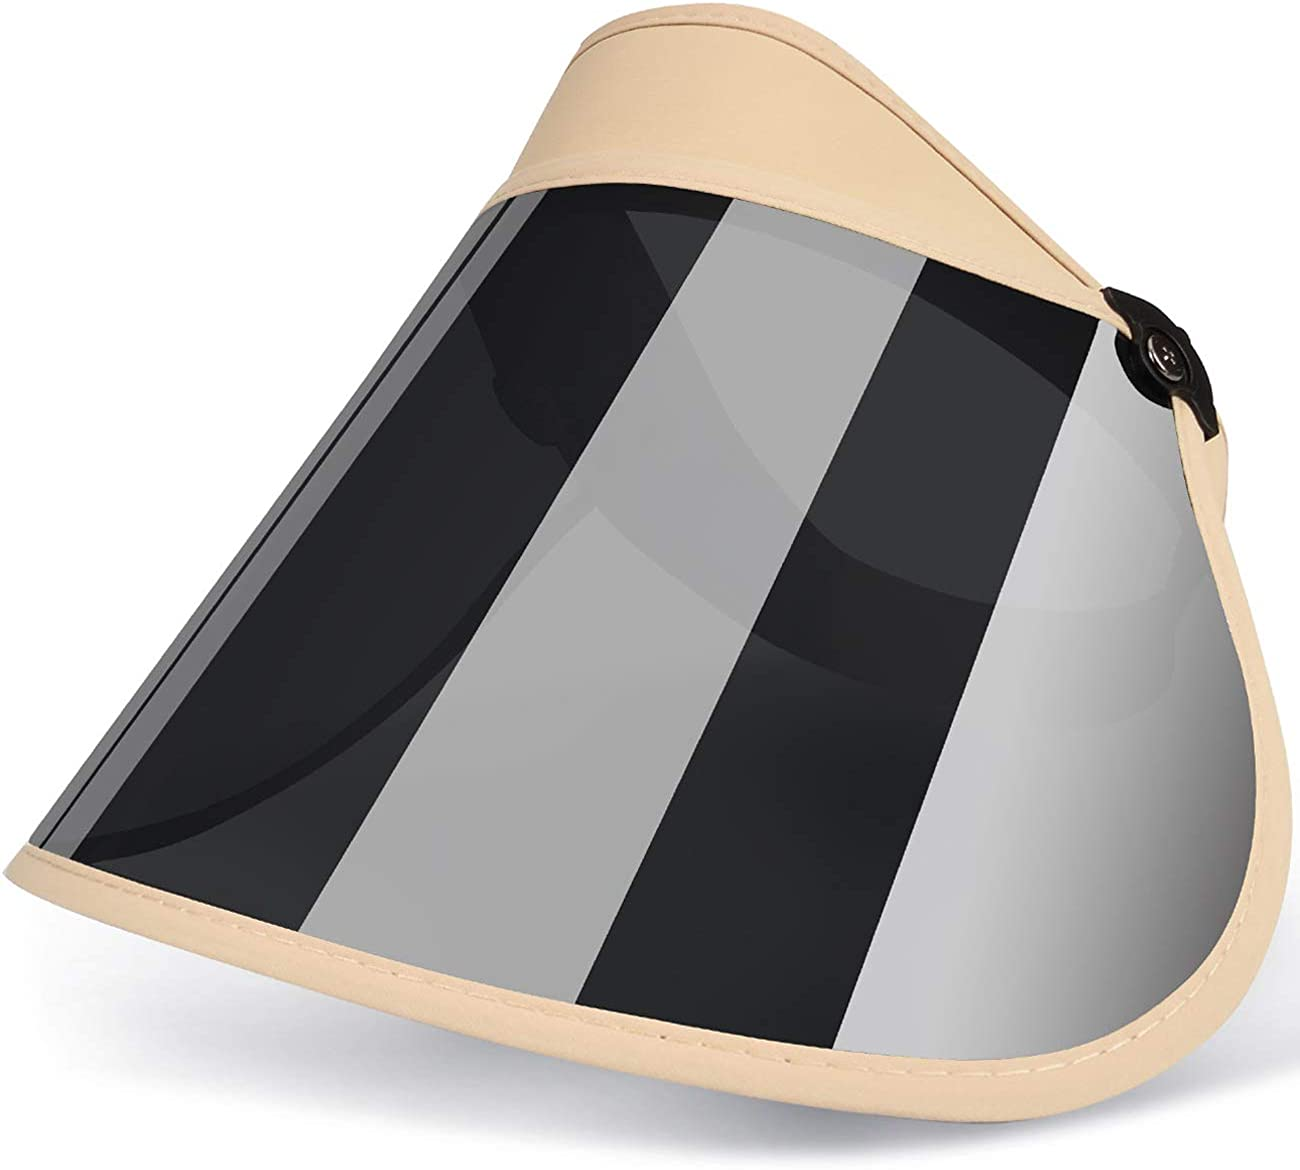 Maylisacc Full-Face UV Portection Sun-Visors Adjustable for Women Packable Sun Visor Hat for Summer Outdoors Cycling